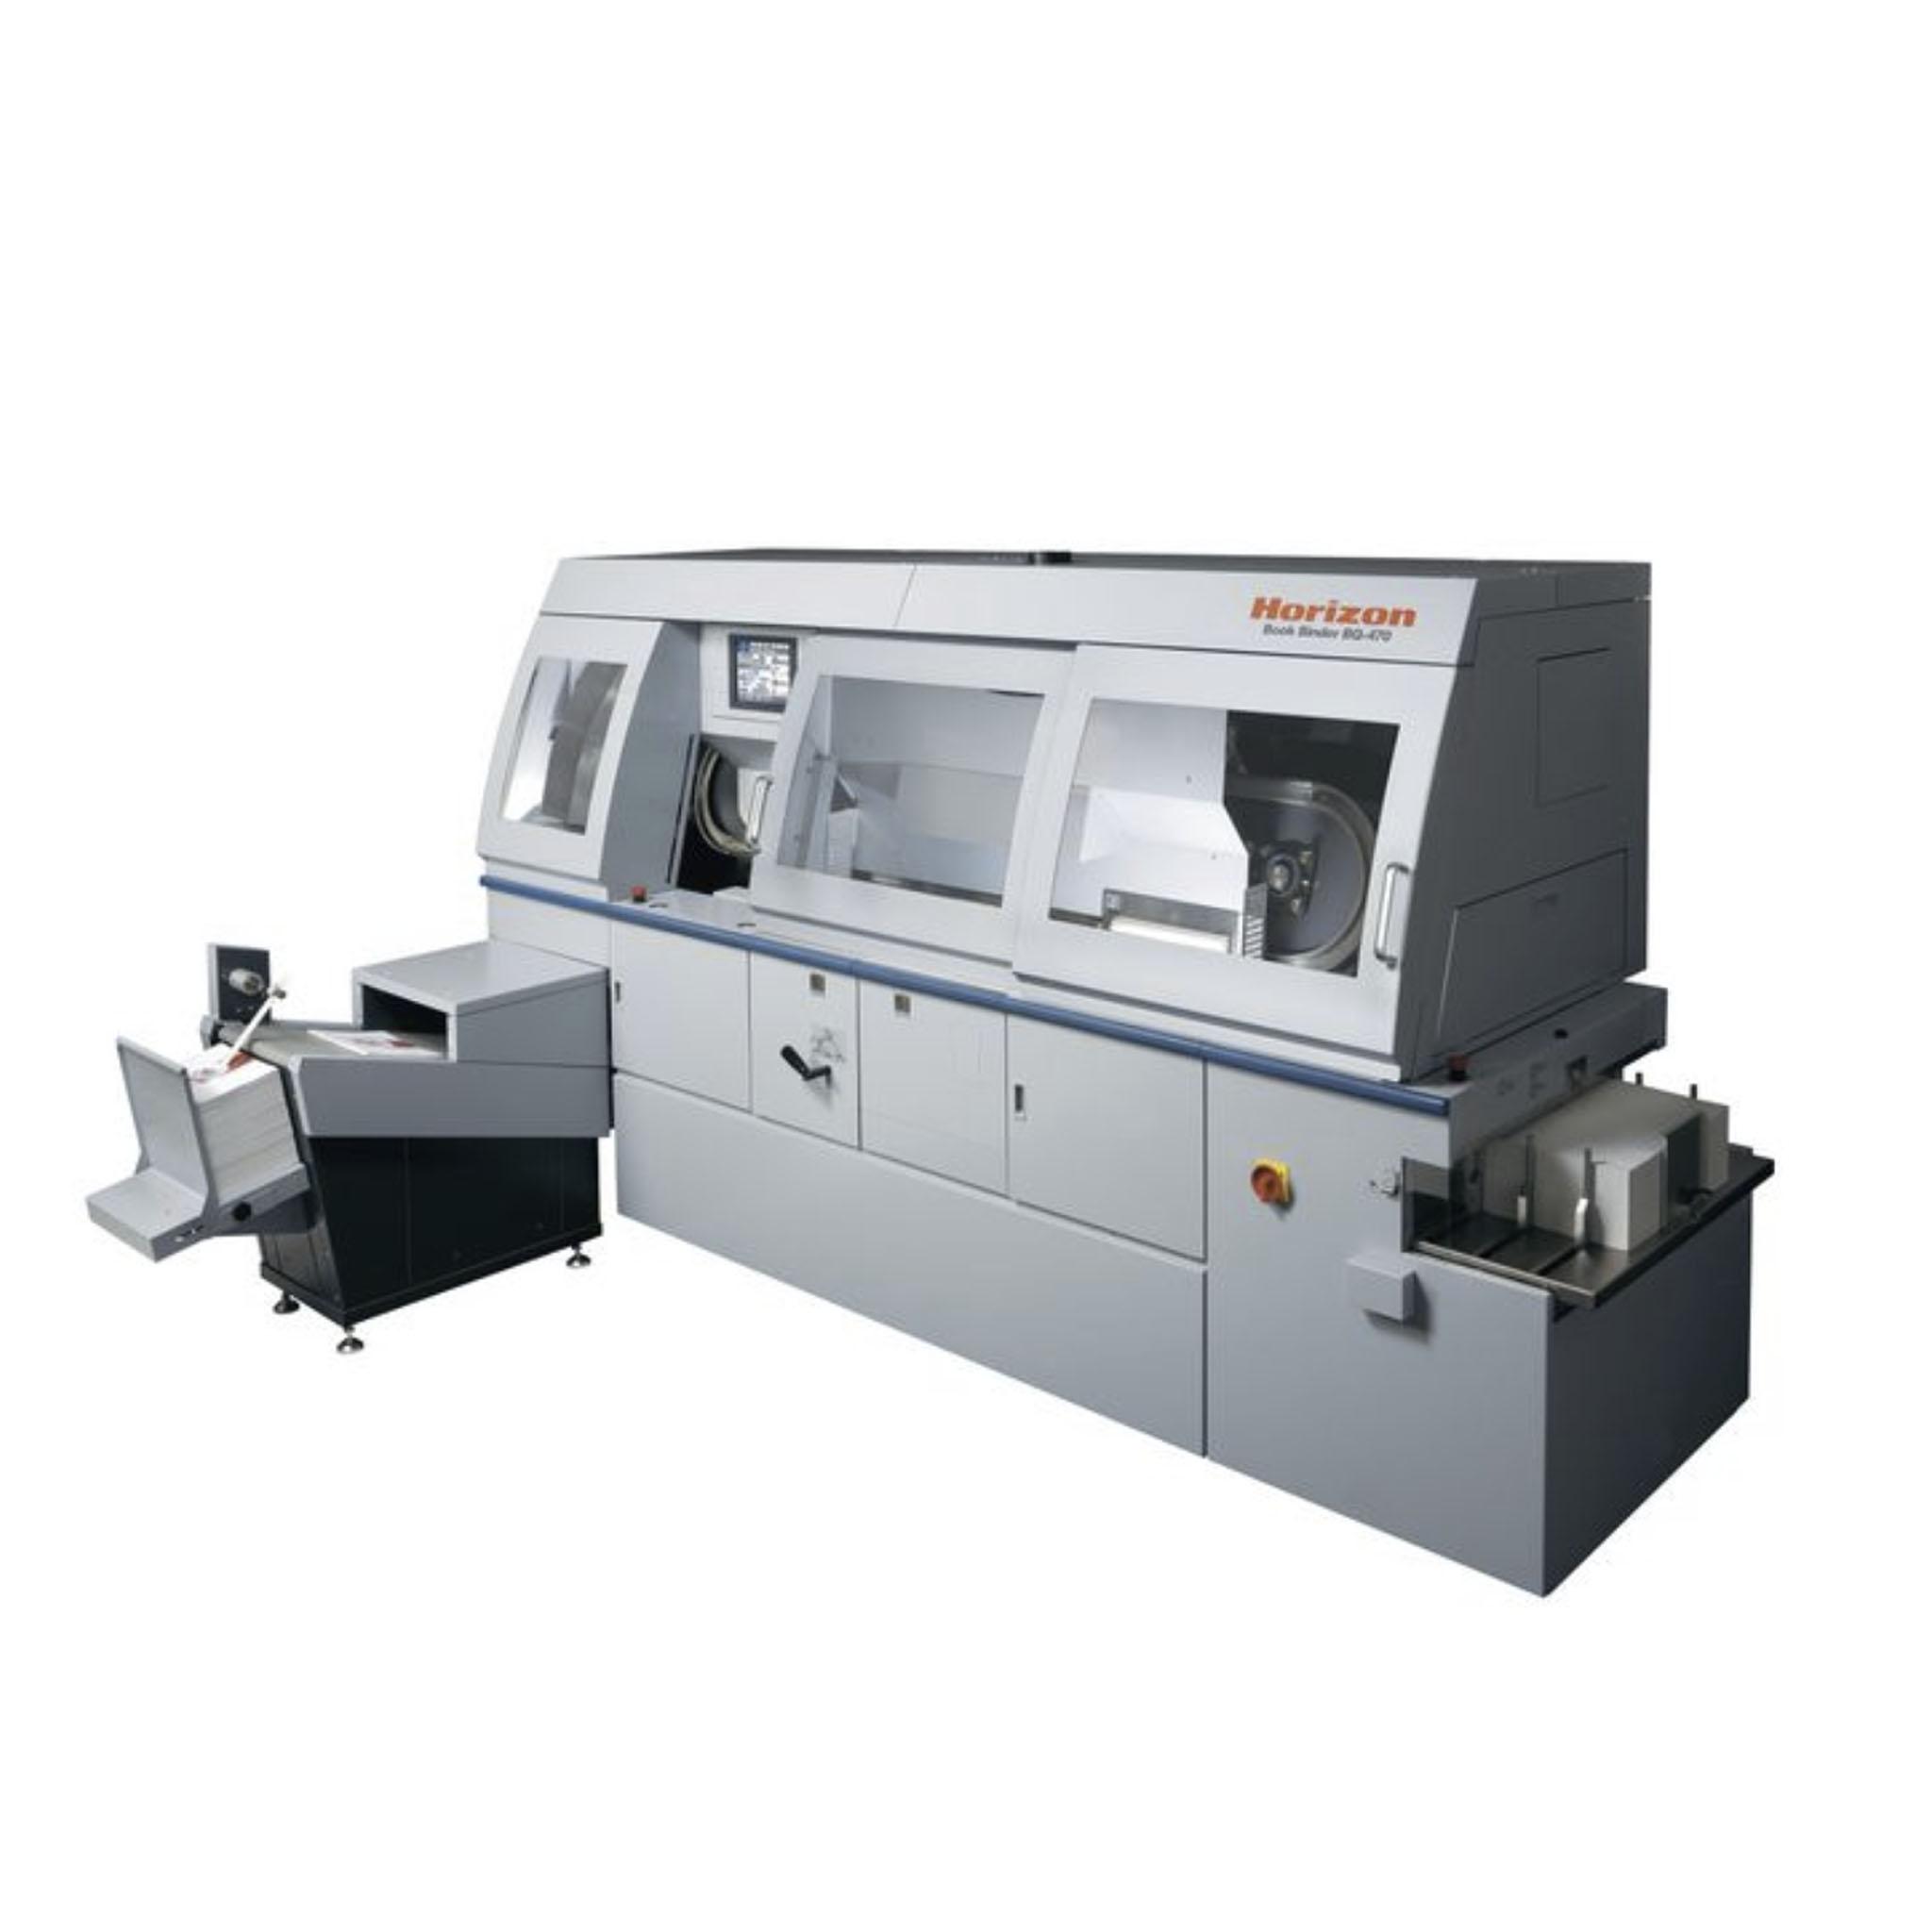 Eniath's Printing